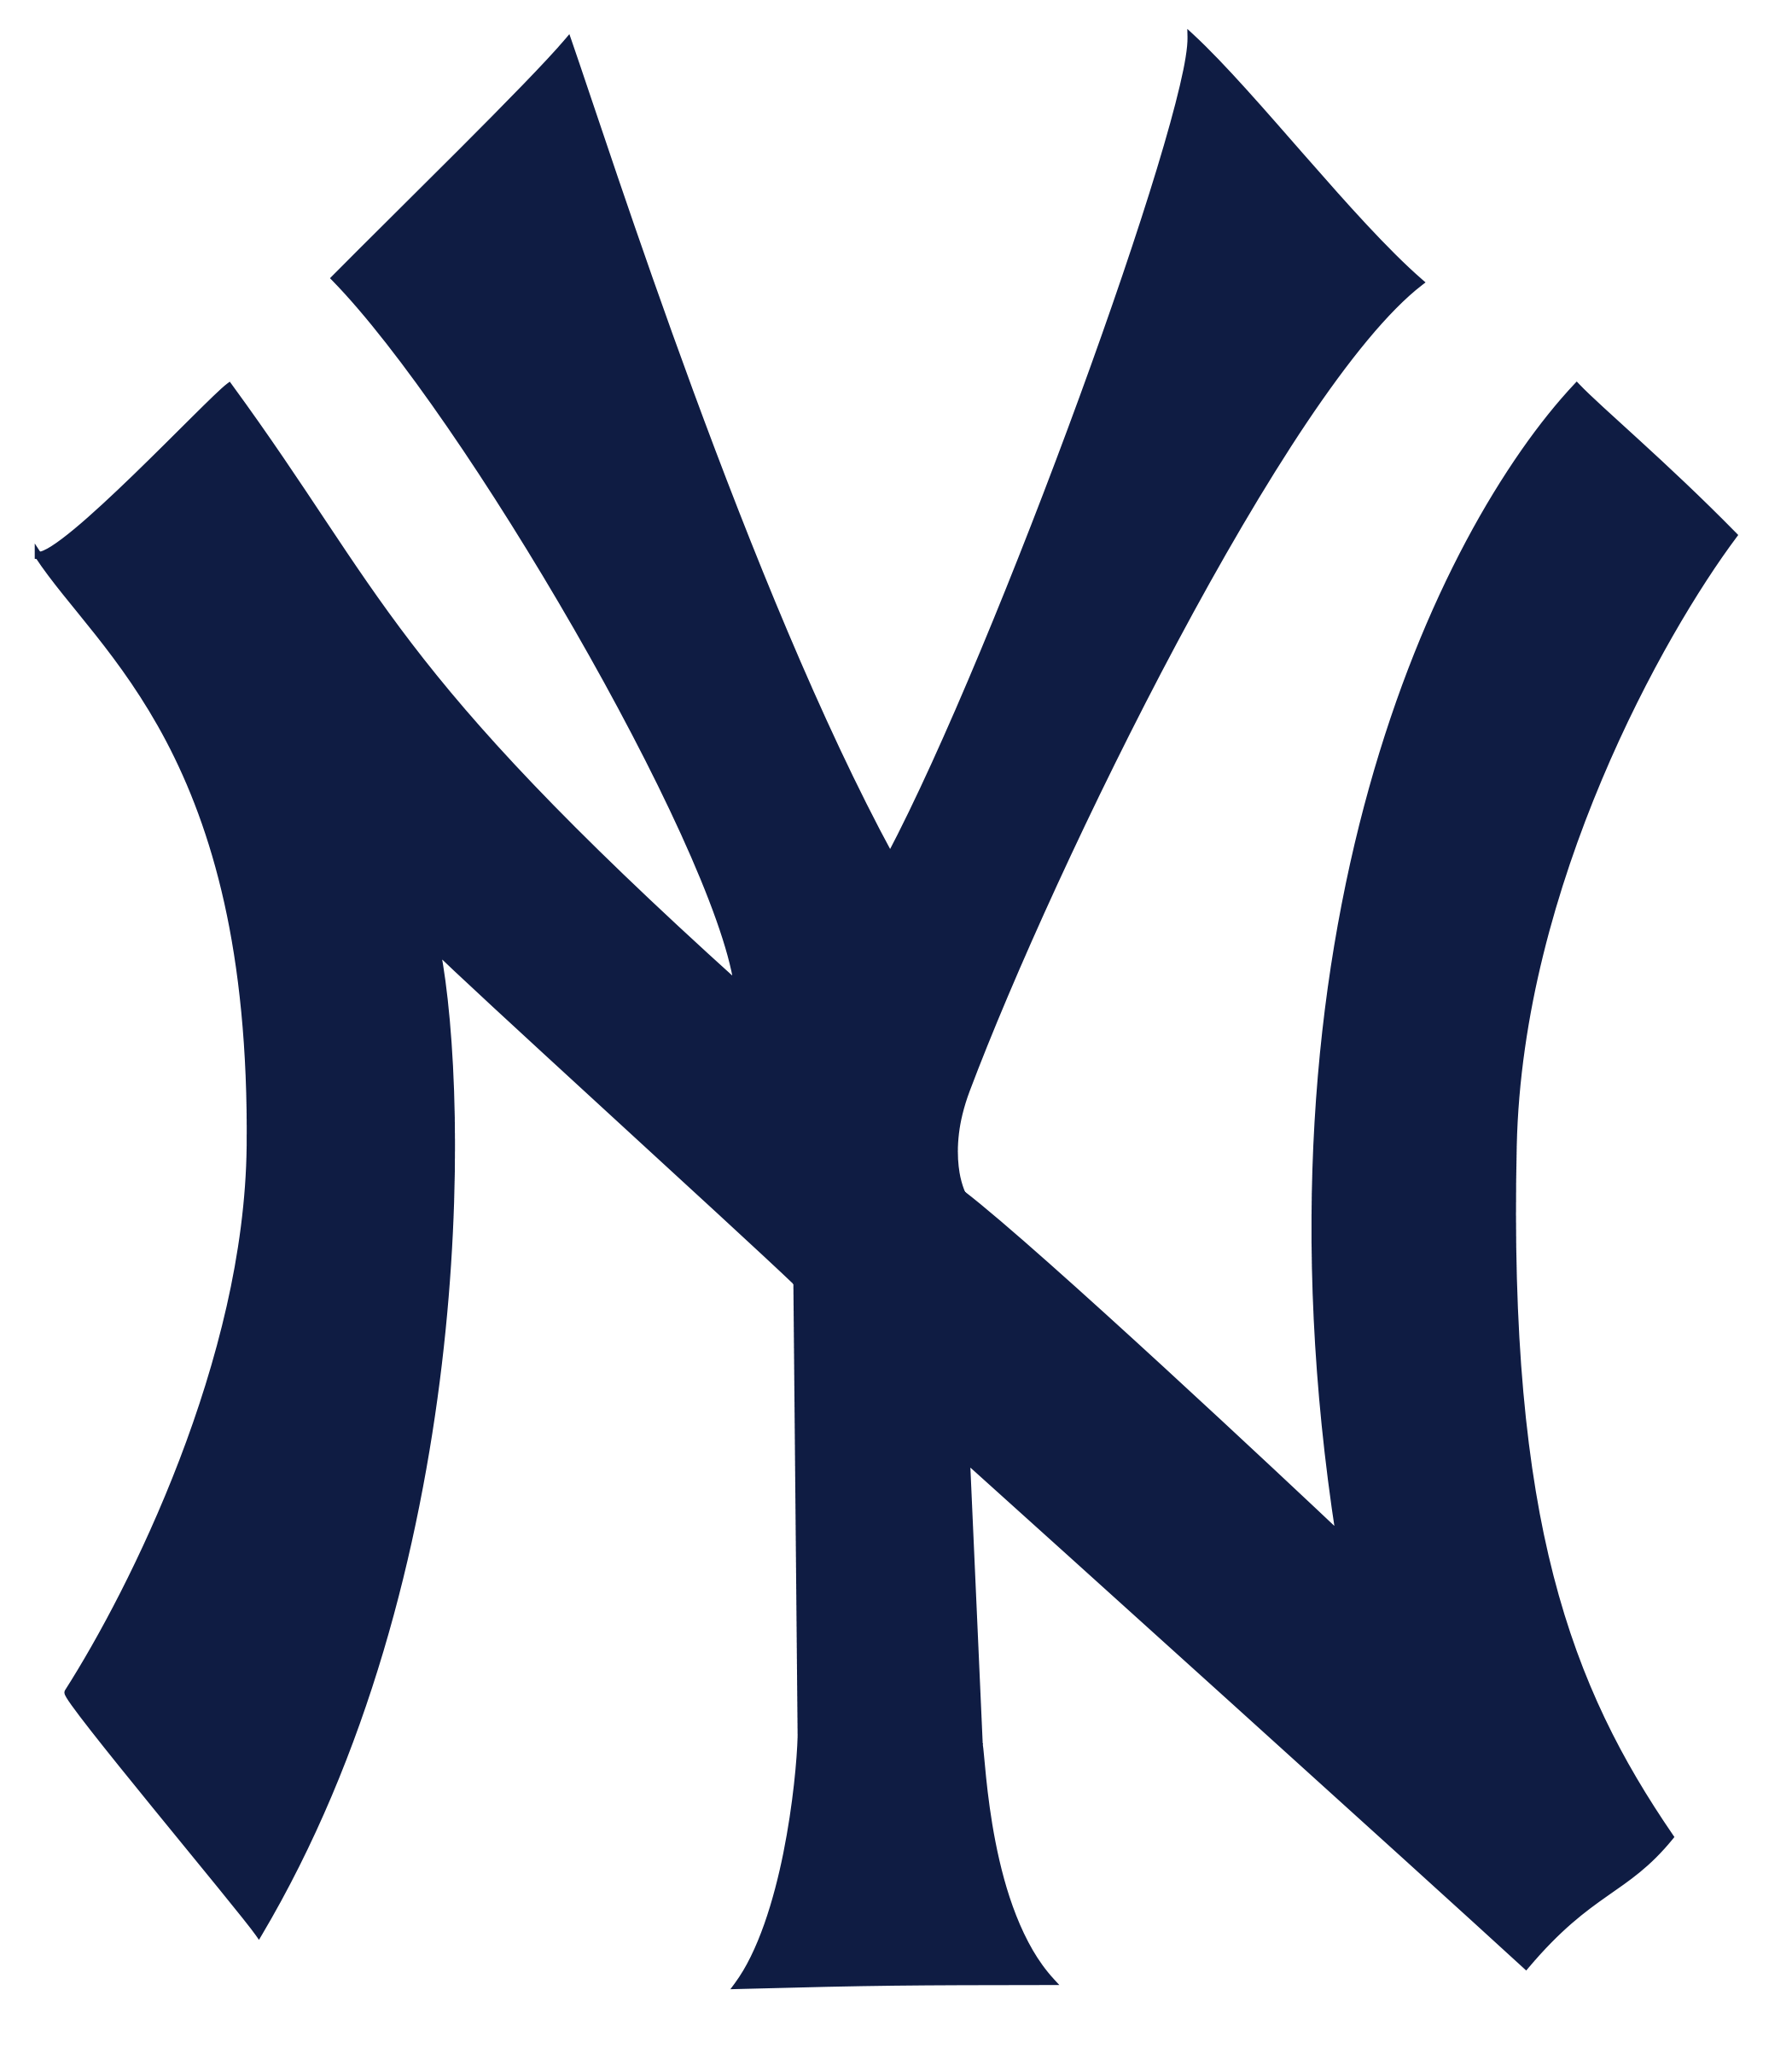 New York Yankees.